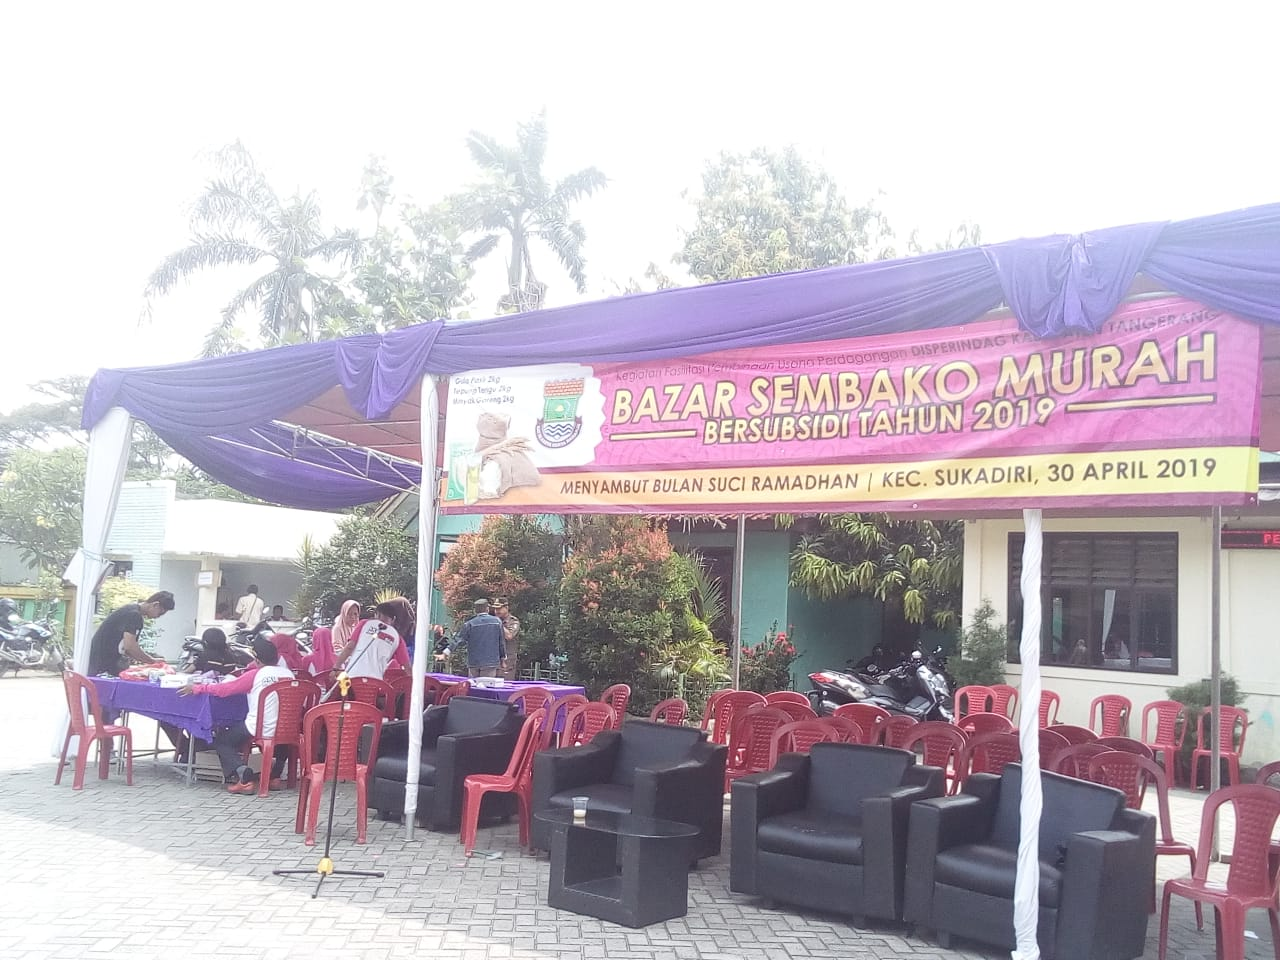 Disperindag bersama Kecamatan Sukadiri Gelar Bazar Sembako Murah  Untuk Warga